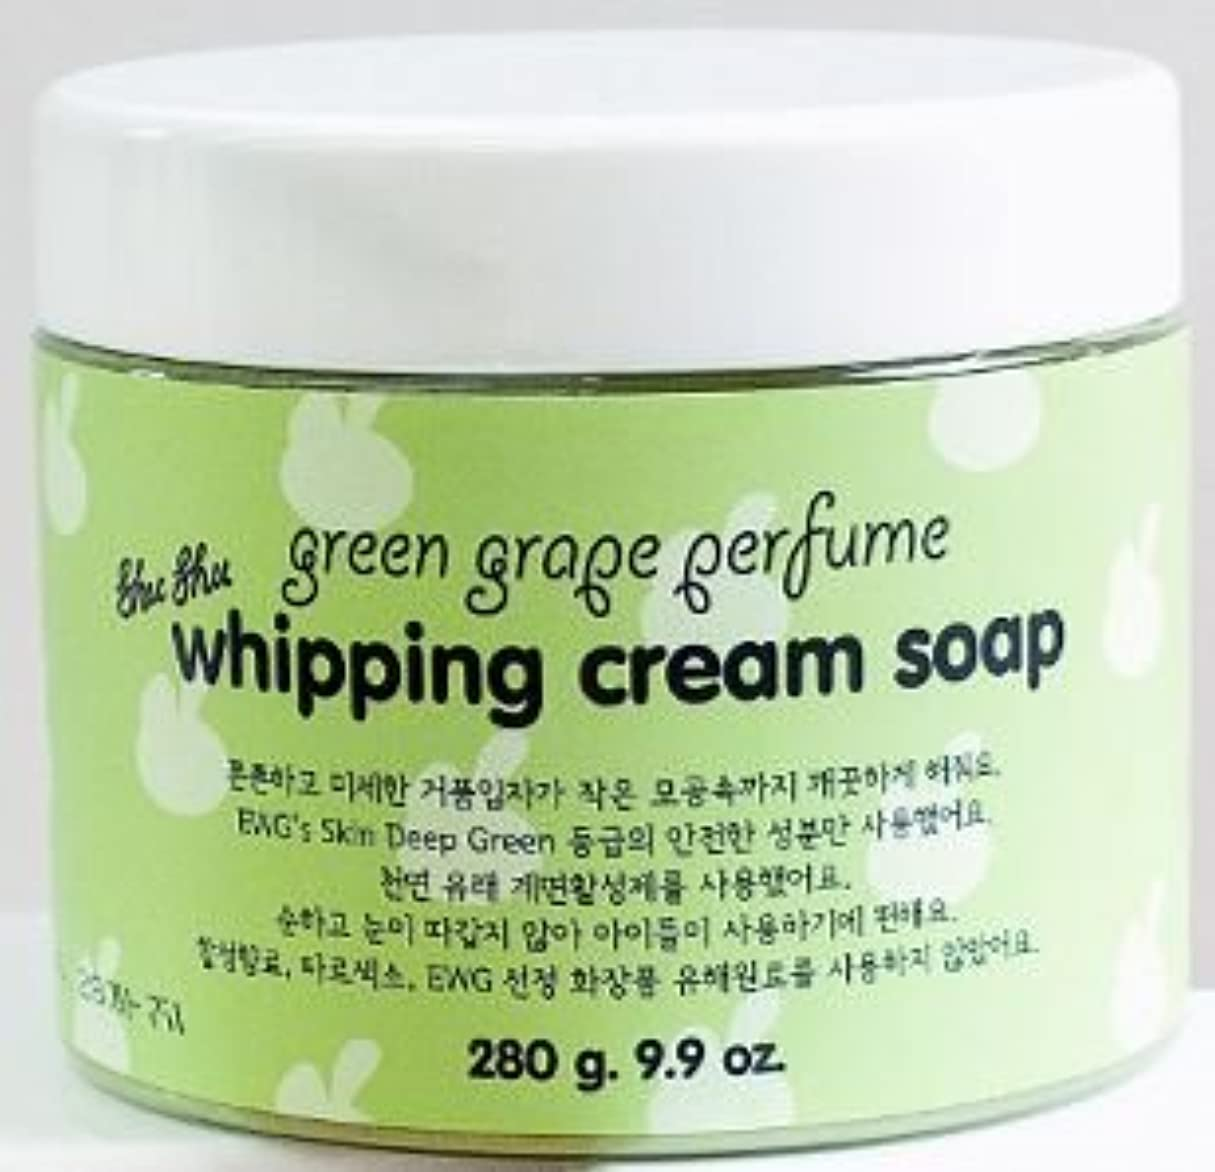 KDシュシュ ホイップ クリーム ソープ (Green Grape perfume)